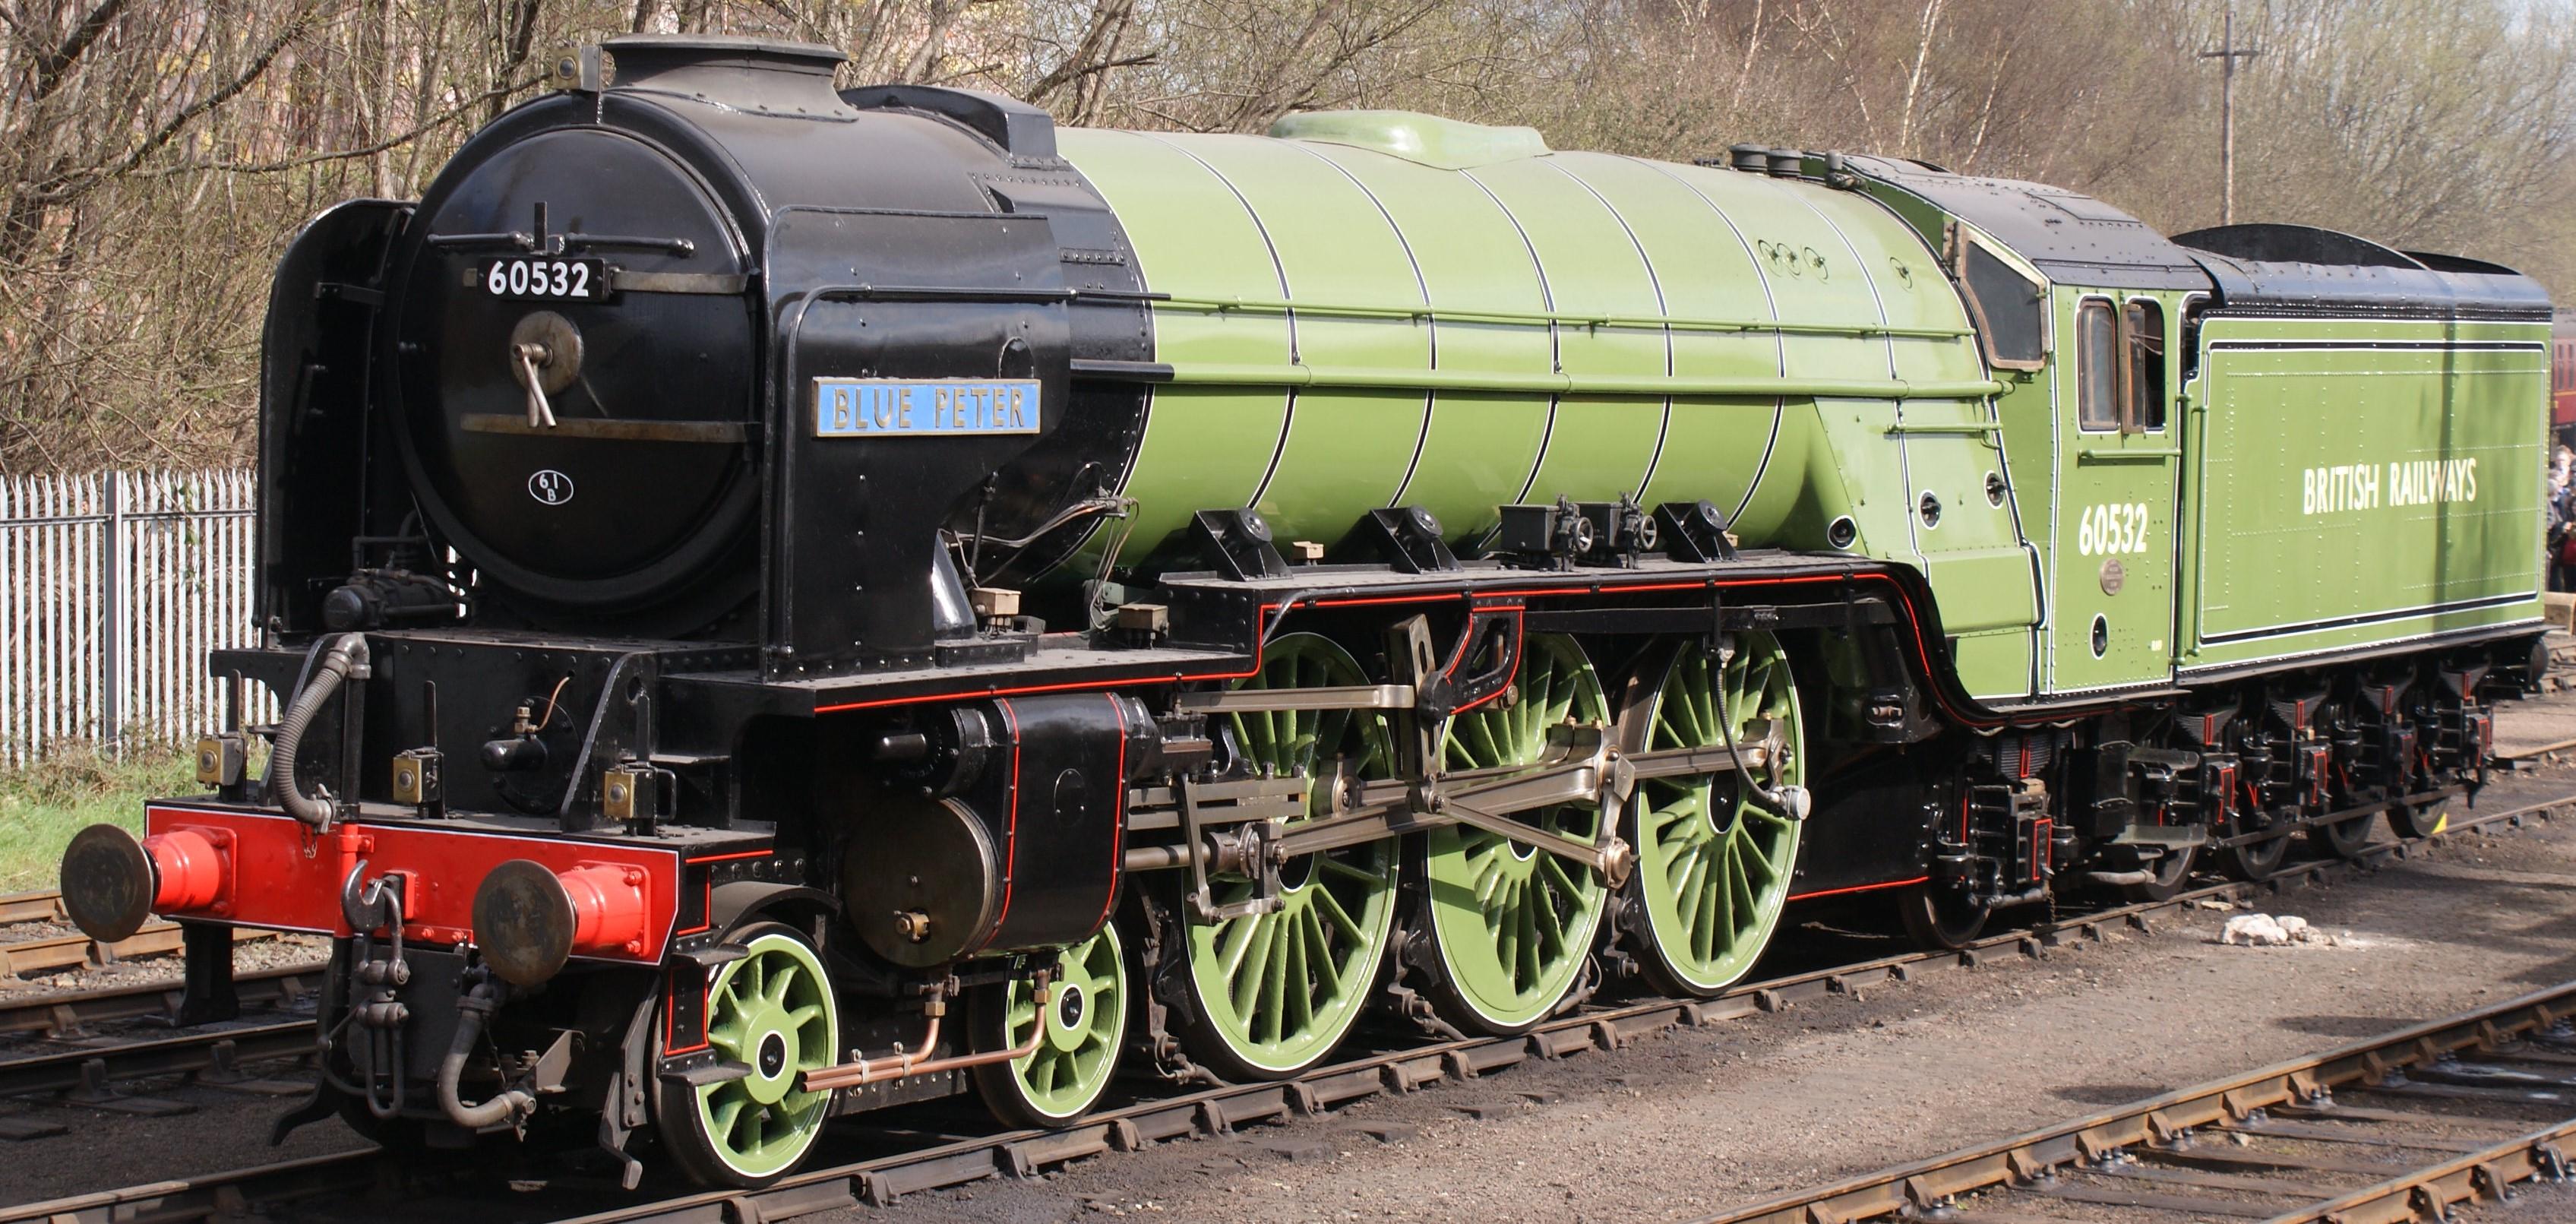 60532 'Blue Peter' at  Barrow Hill in April 2009. ©Hugh Llewelyn